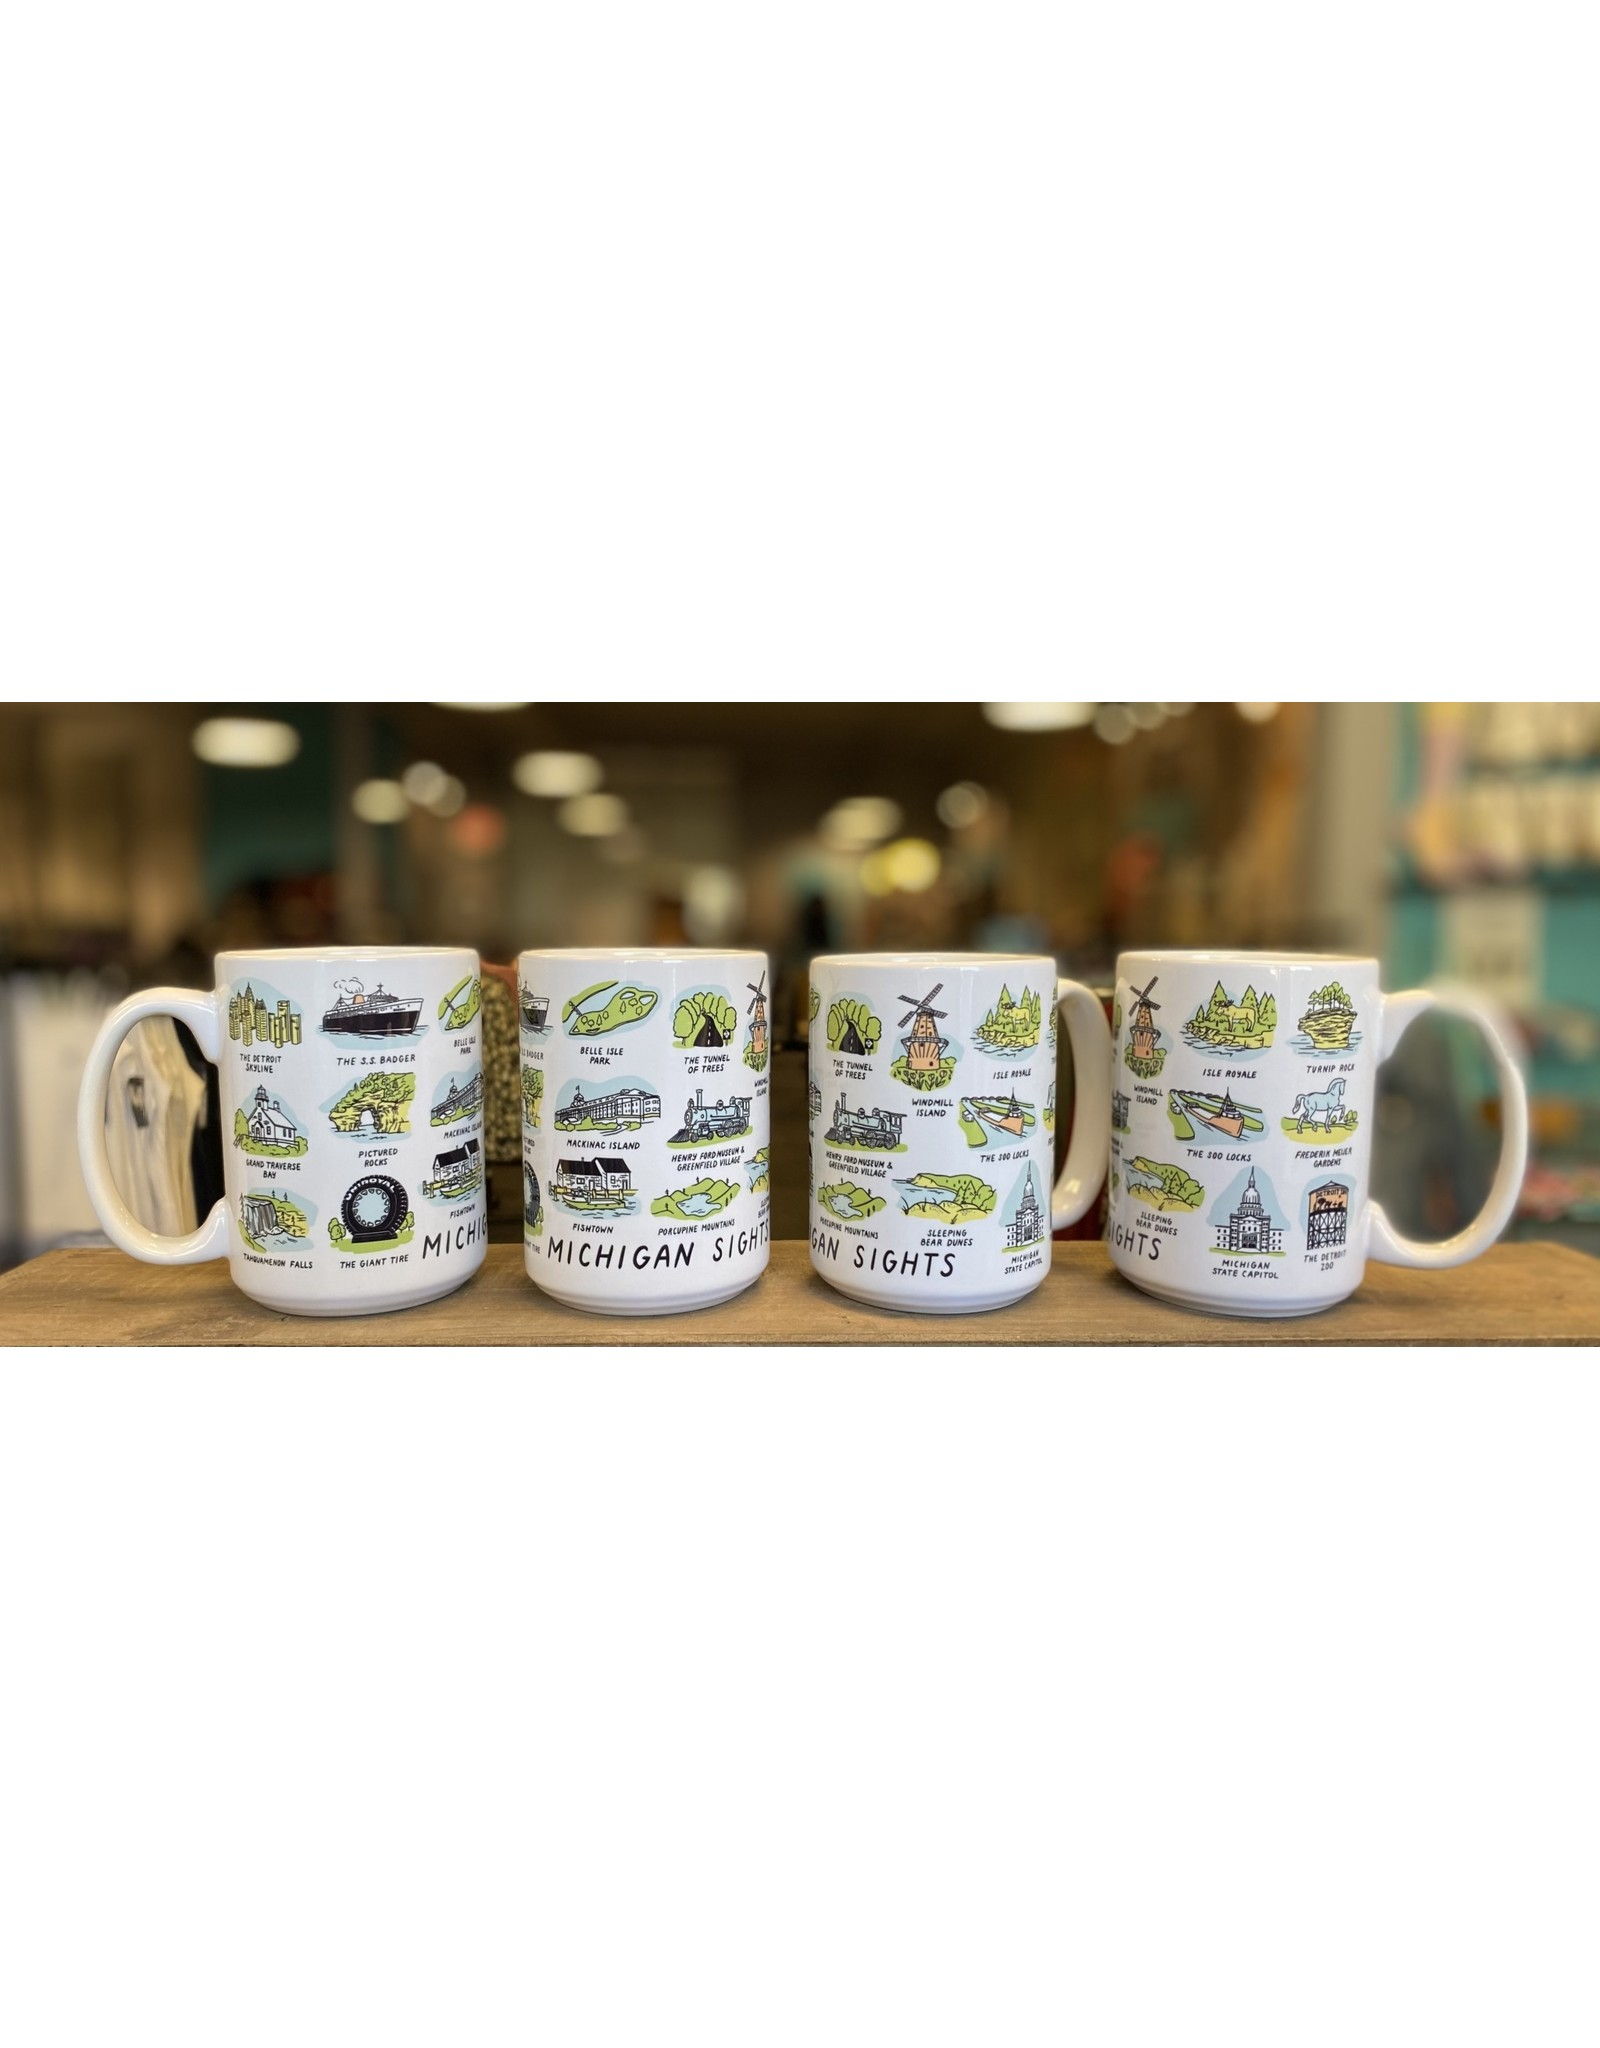 Relish Michigan Sights Mug